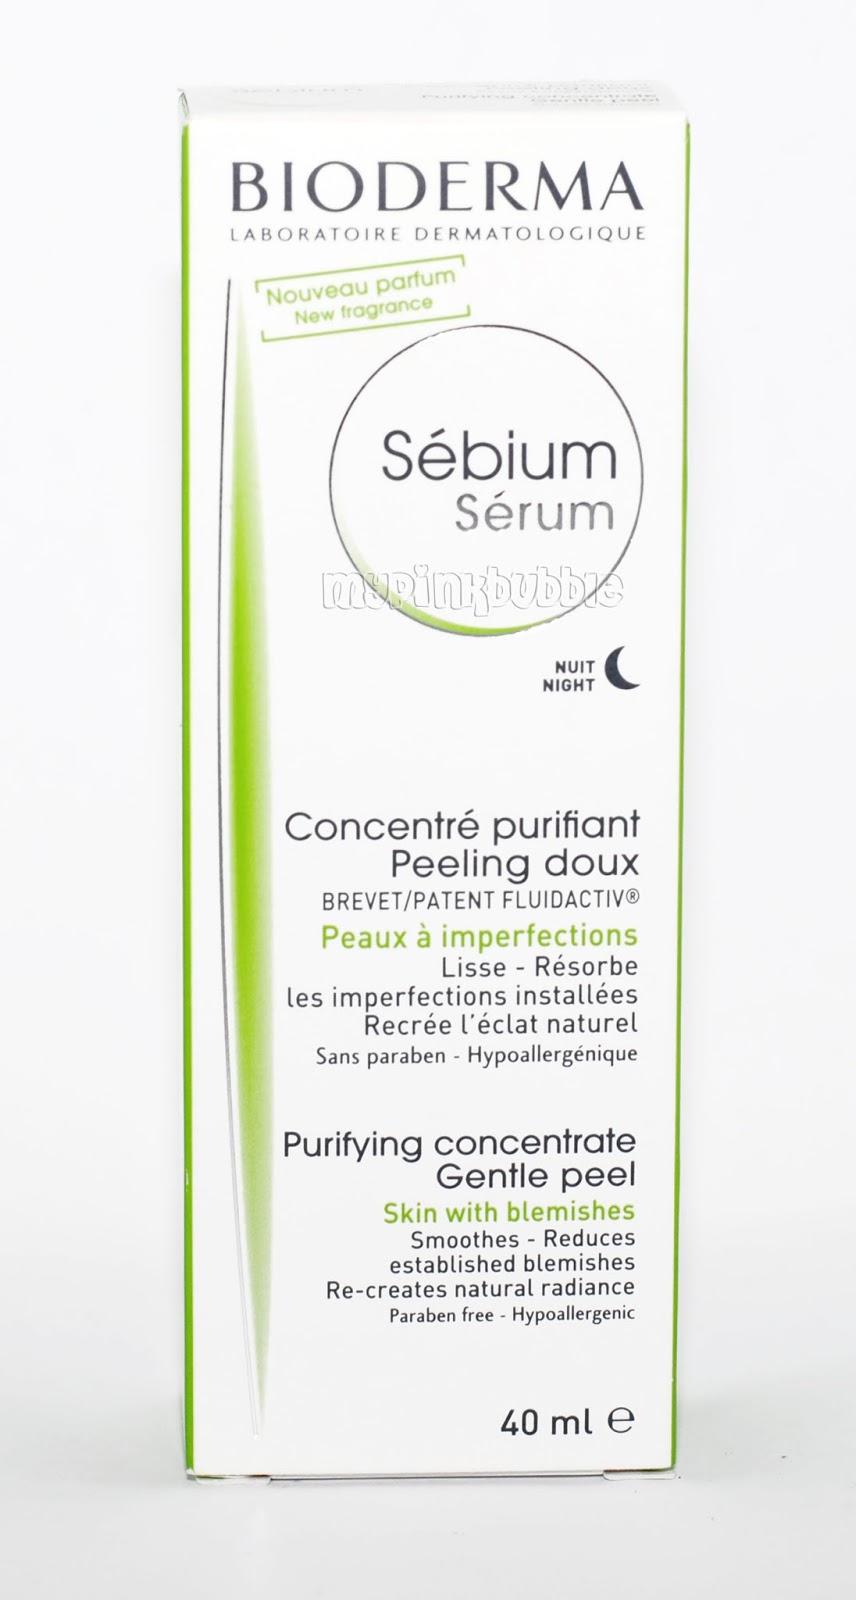 Sebium Serum de Bioderma